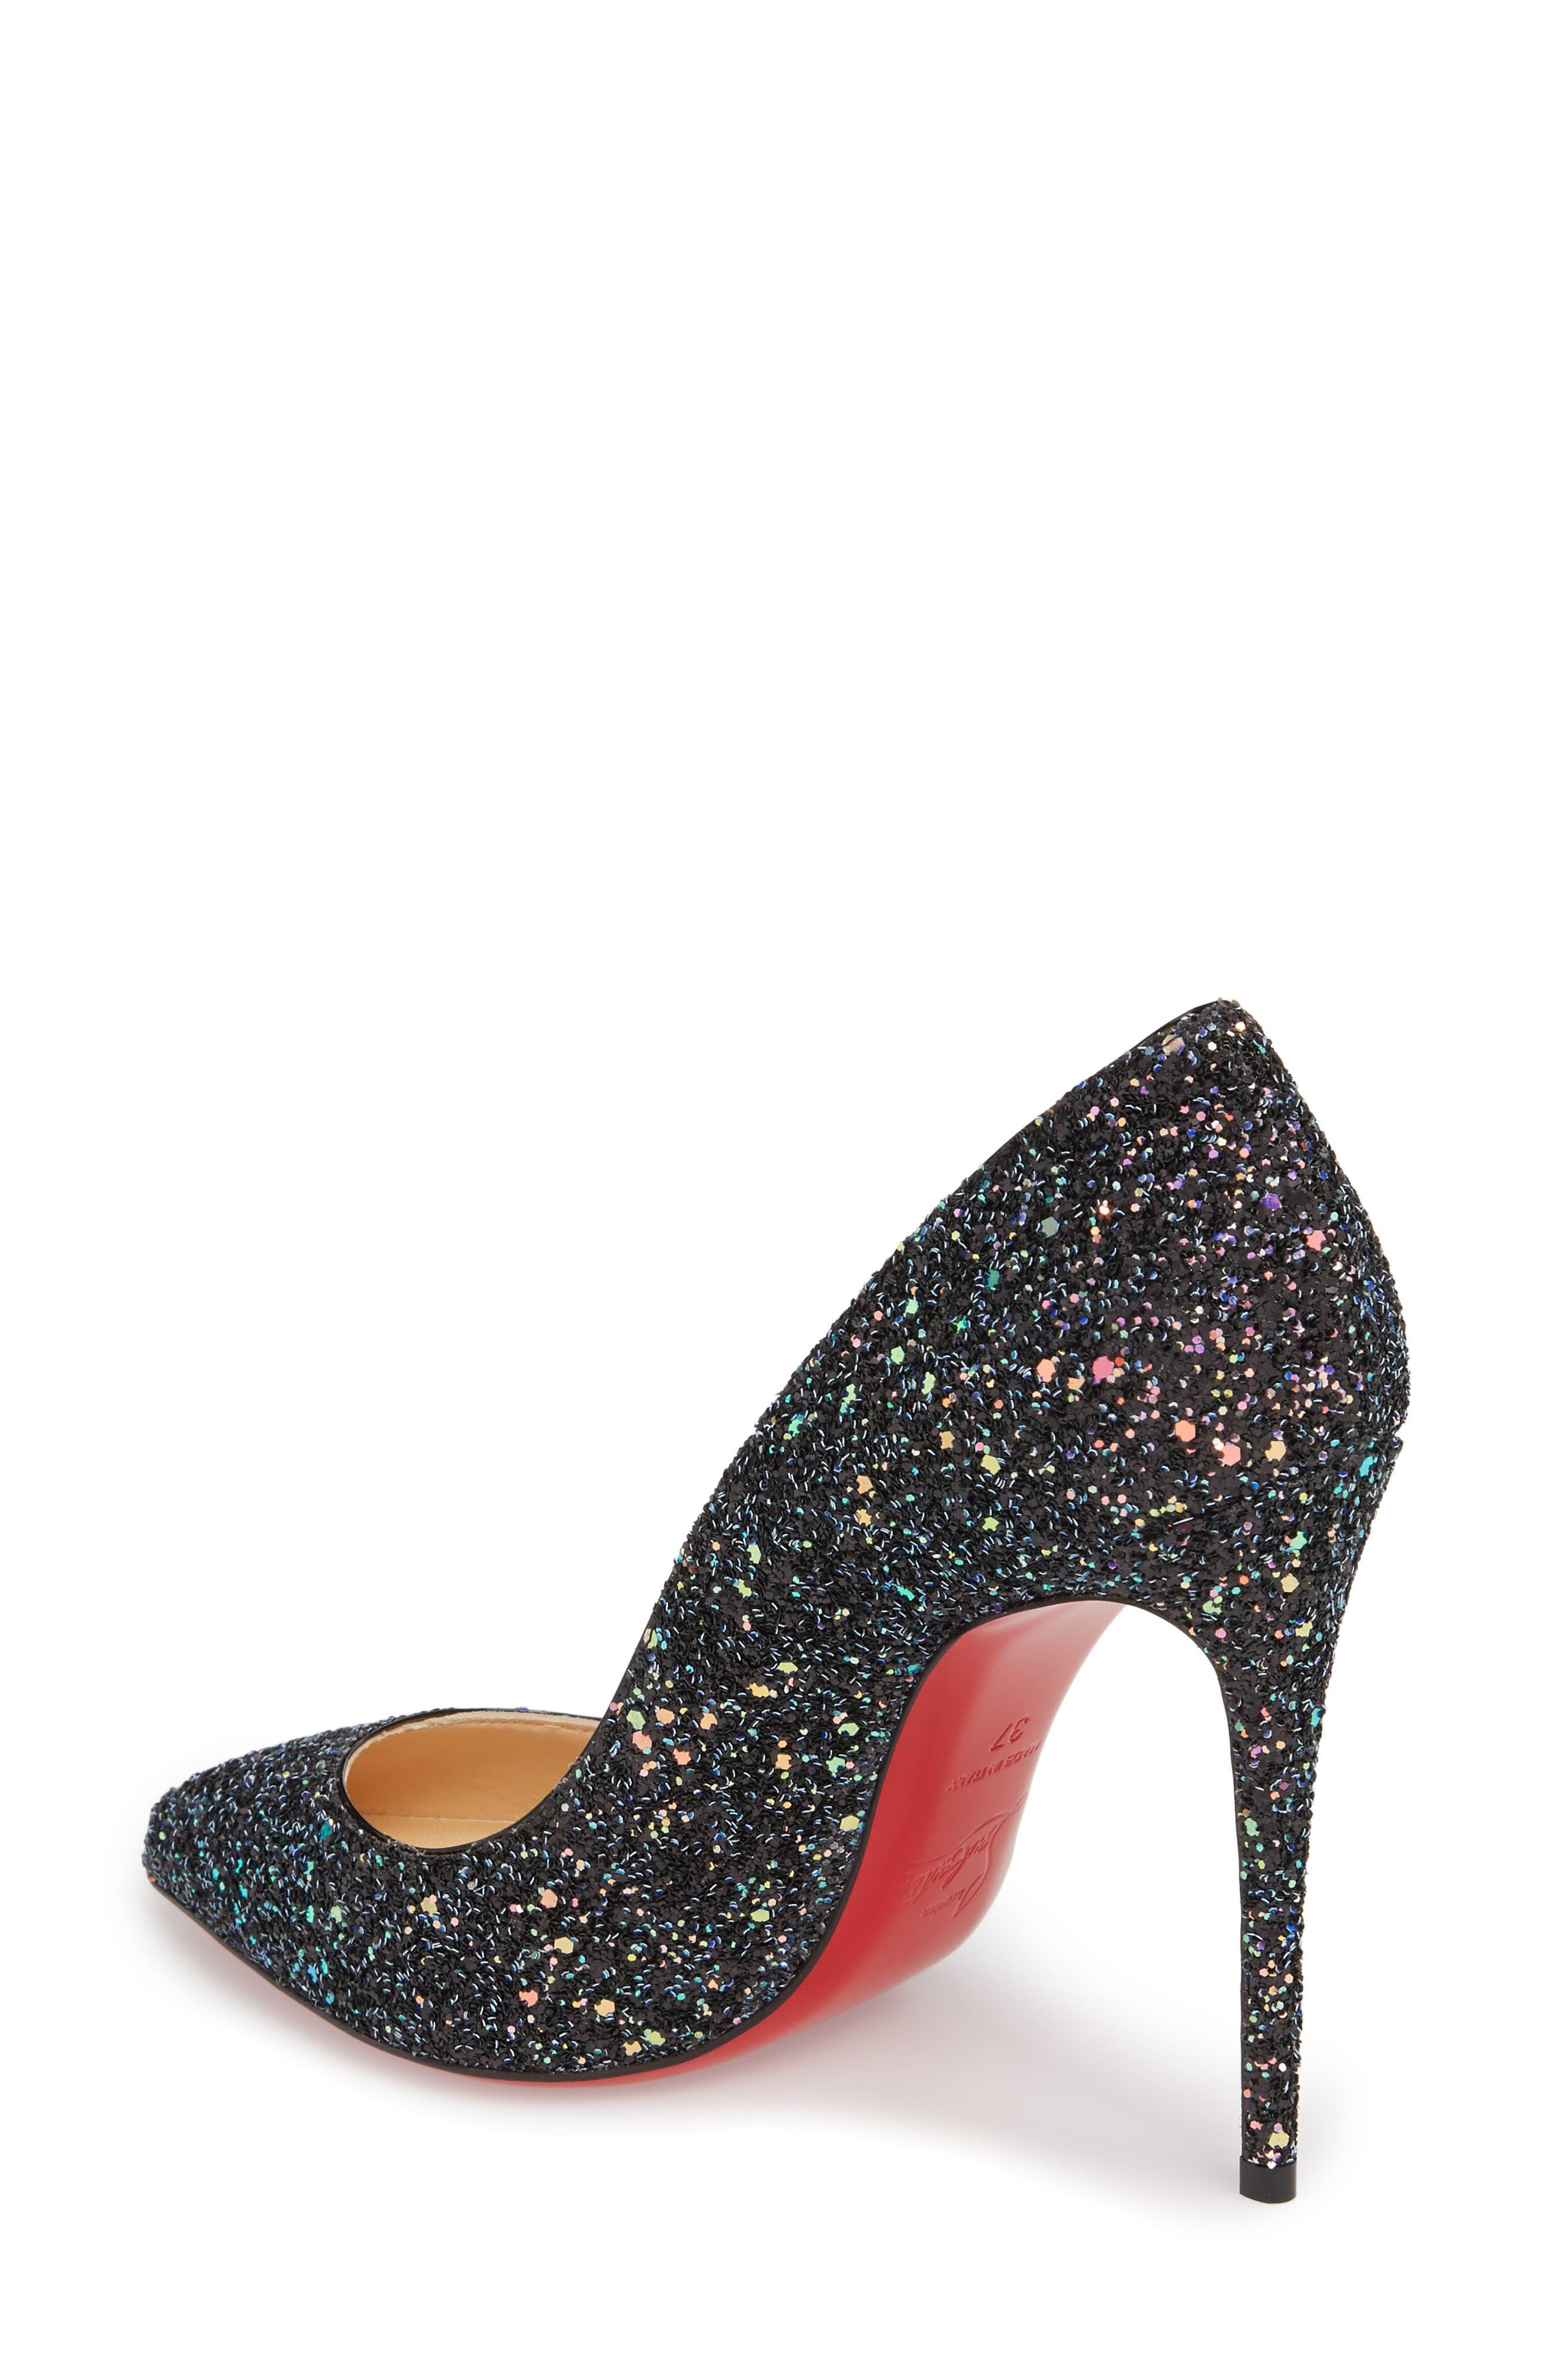 CHRISTIAN LOUBOUTIN Pigalle Follies Glitter Pointy Toe Pump, Black